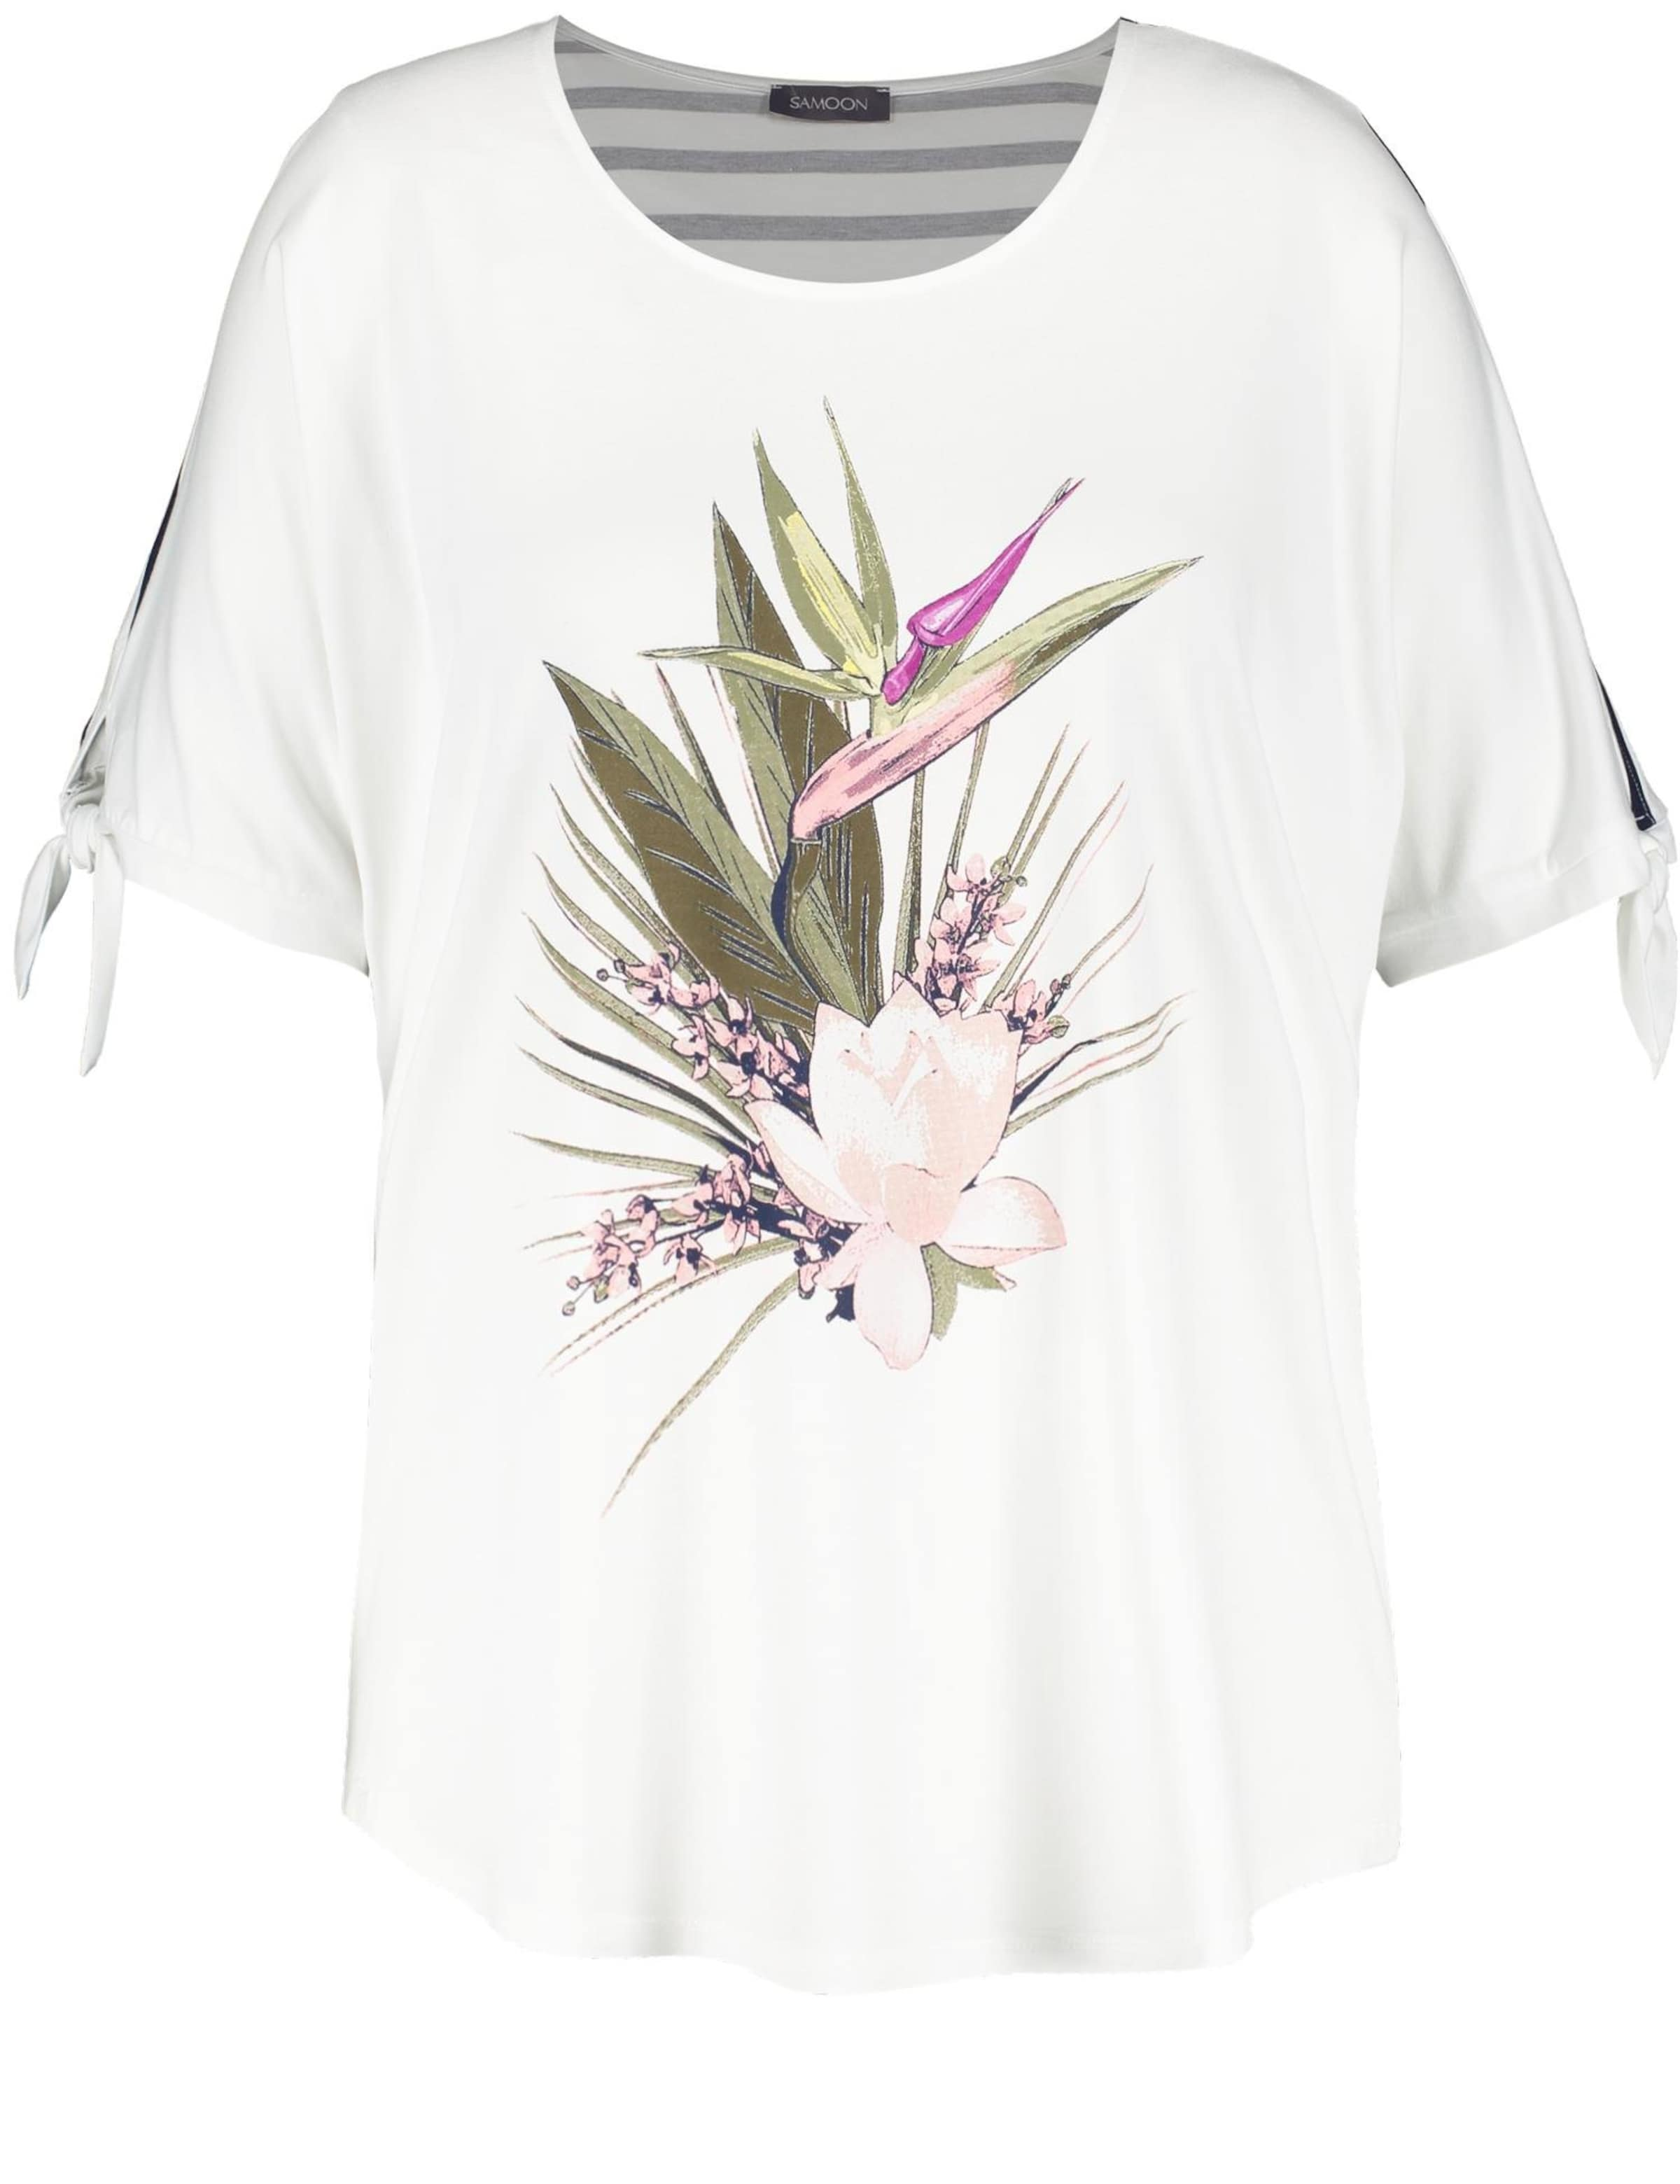 T Samoon shirt Samoon In shirt In T MischfarbenOffwhite l1FKc3TJ